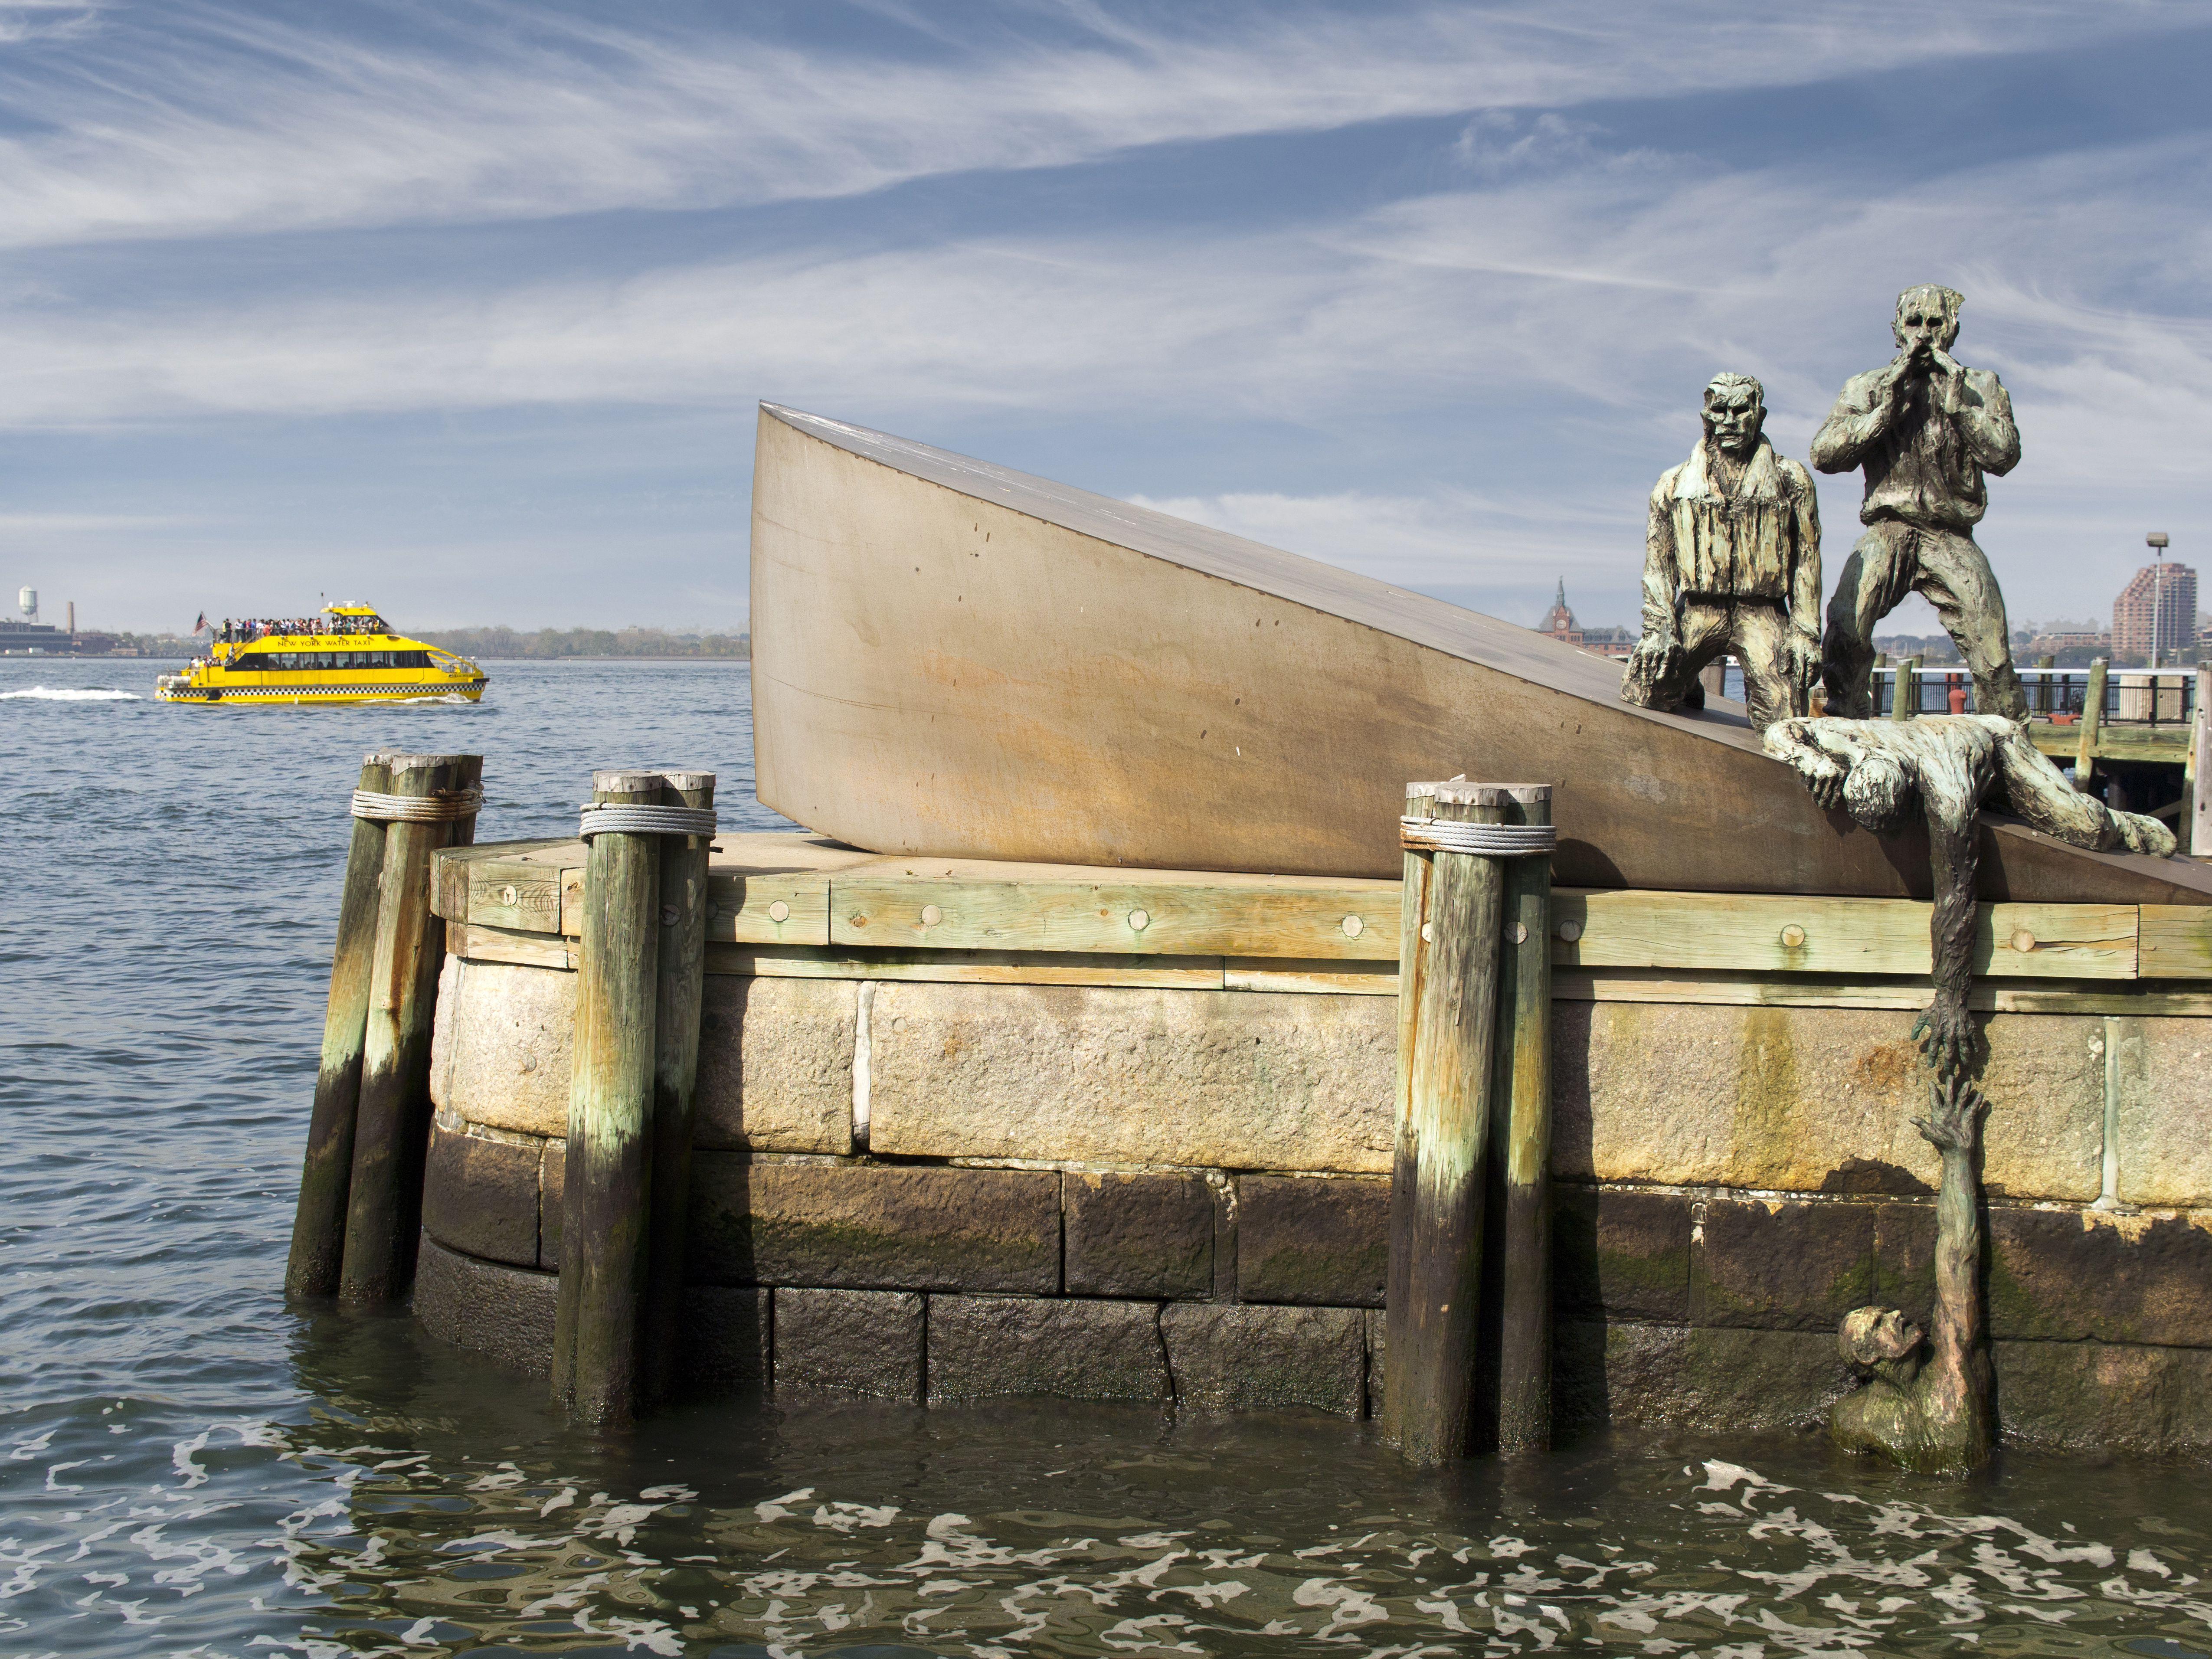 american merchant mariner's memorial